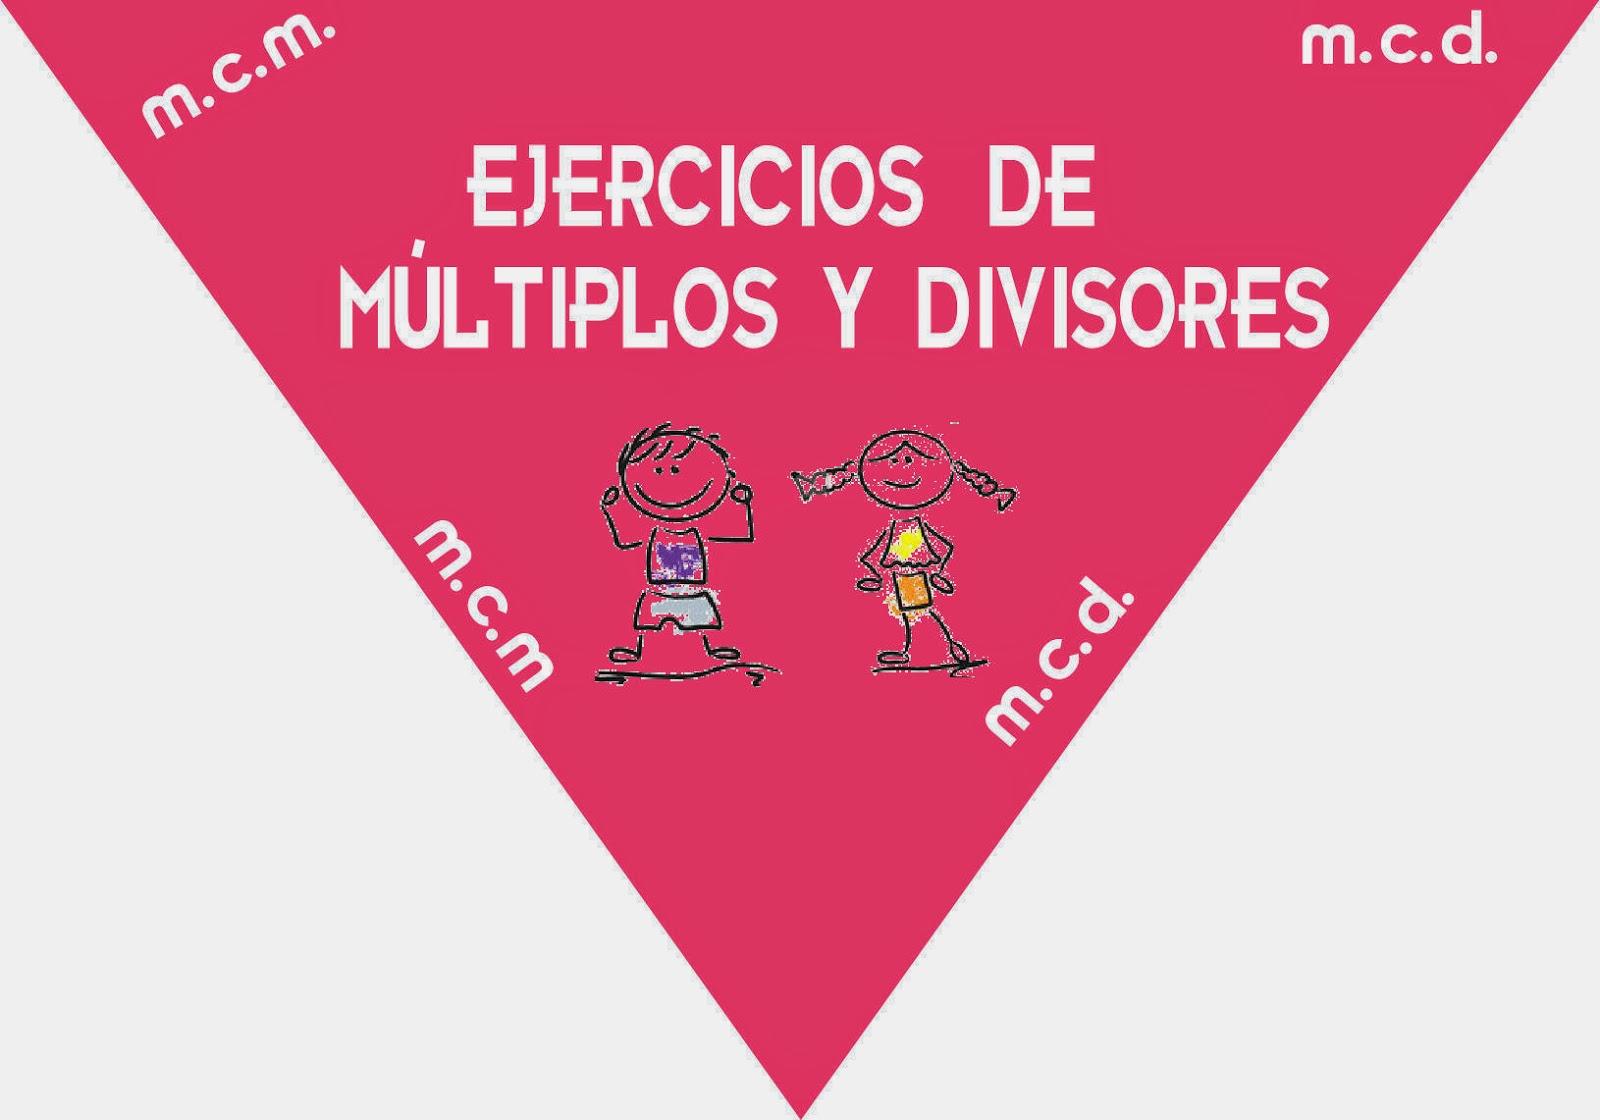 http://colegiolosrosales.net/web6primaria/sextoprimaria/asignaturas/matemsexto/ejercicios/03divisibilidadejercicios.pdf